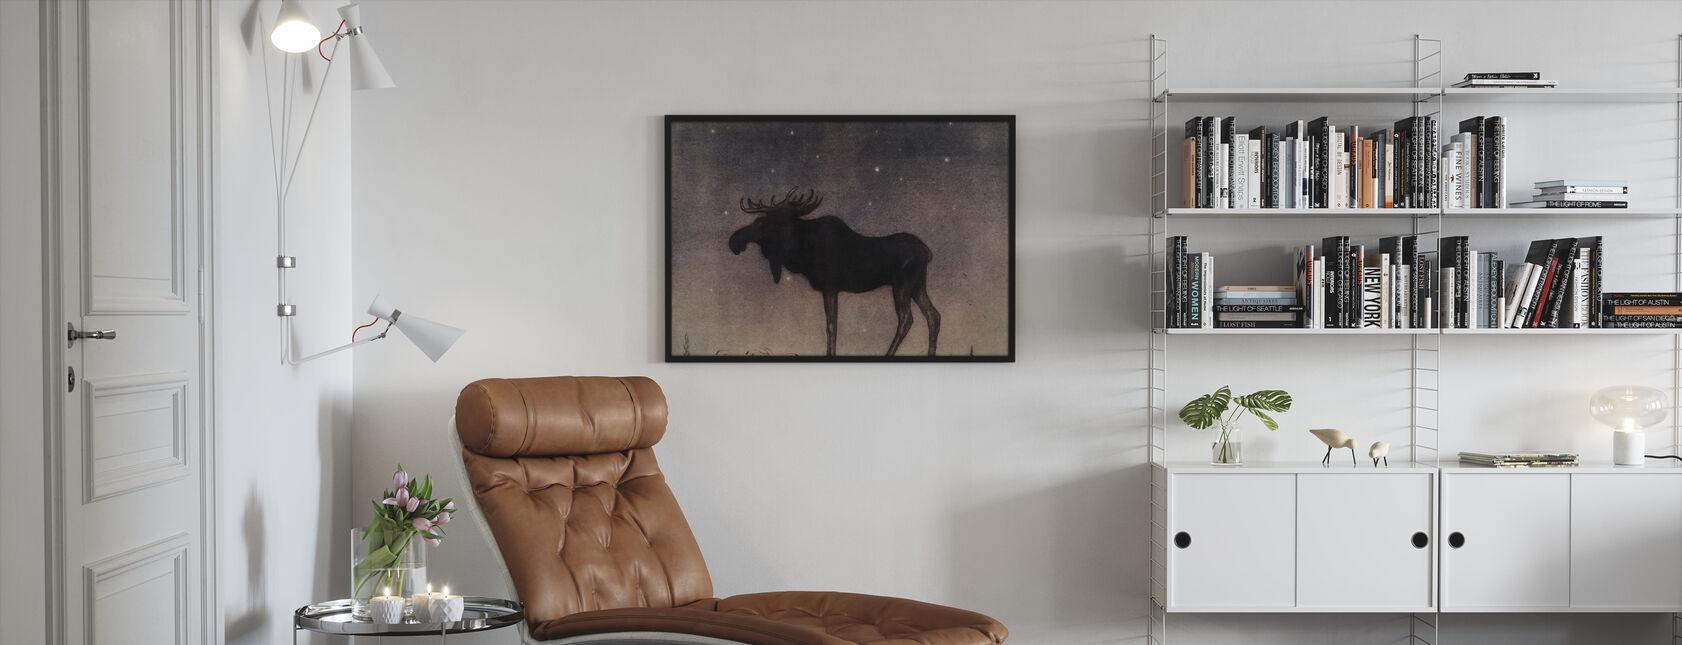 John Bauer - Älgtjuren - Innrammet bilde - Stue